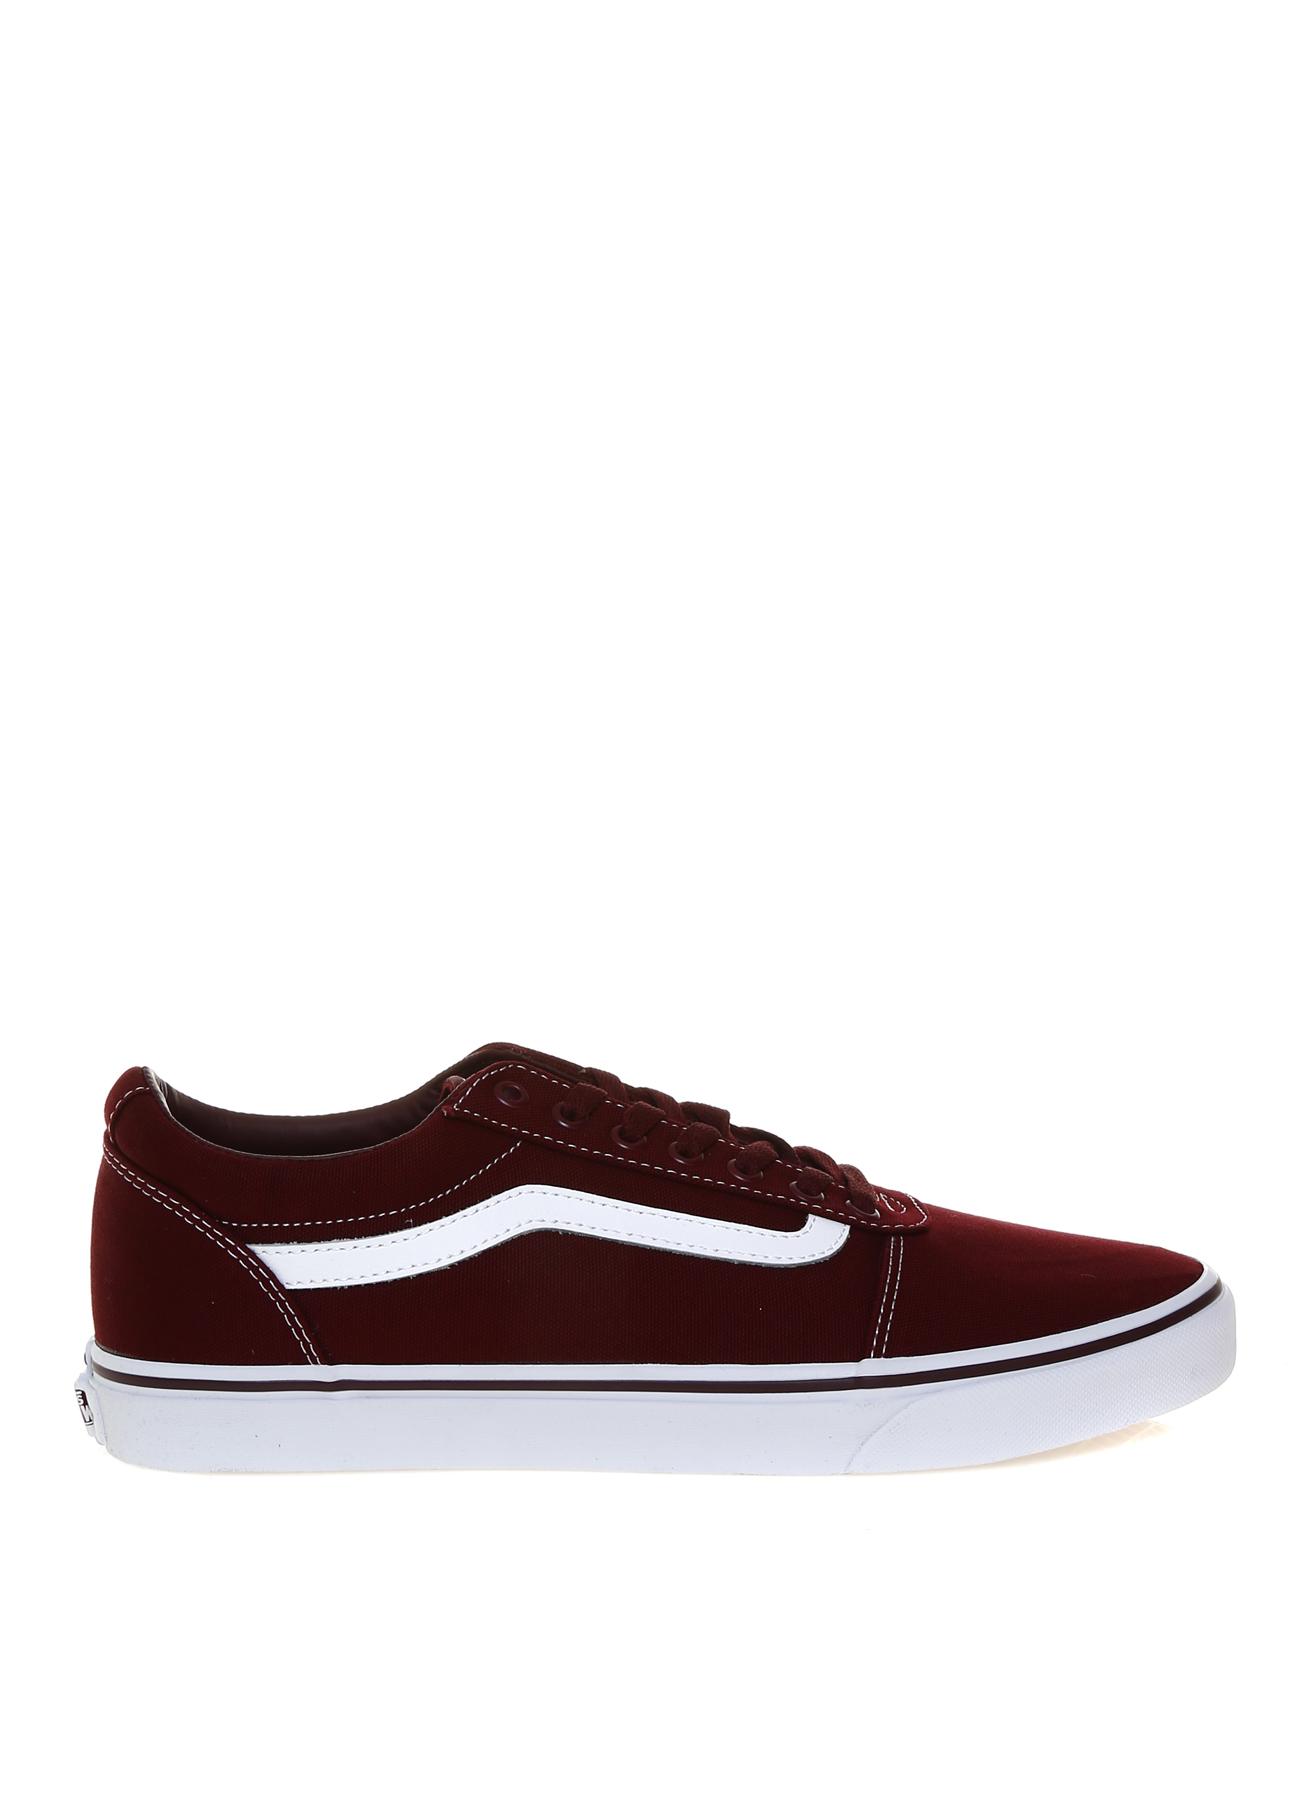 10cb025c515f9 41 Bordo Vans Vn0A38Dm8J71 Mn Ward Lifestyle Ayakkabı 5002305545002 & Çanta  Erkek Sneaker